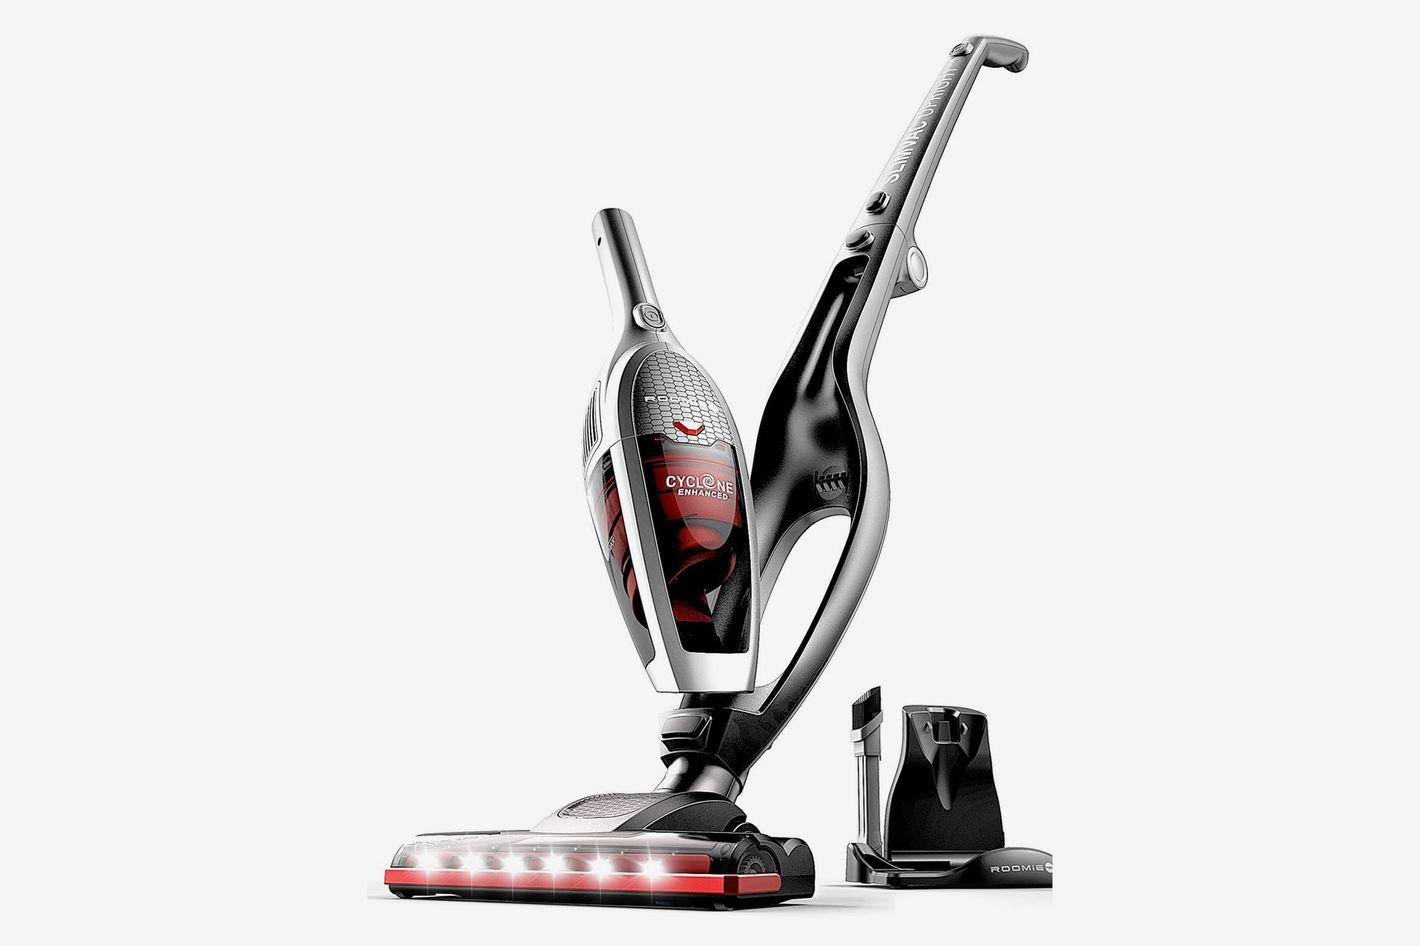 Roomie Tec Cordless Vacuum Cleaner, 2 in 1 Handheld Vacuum